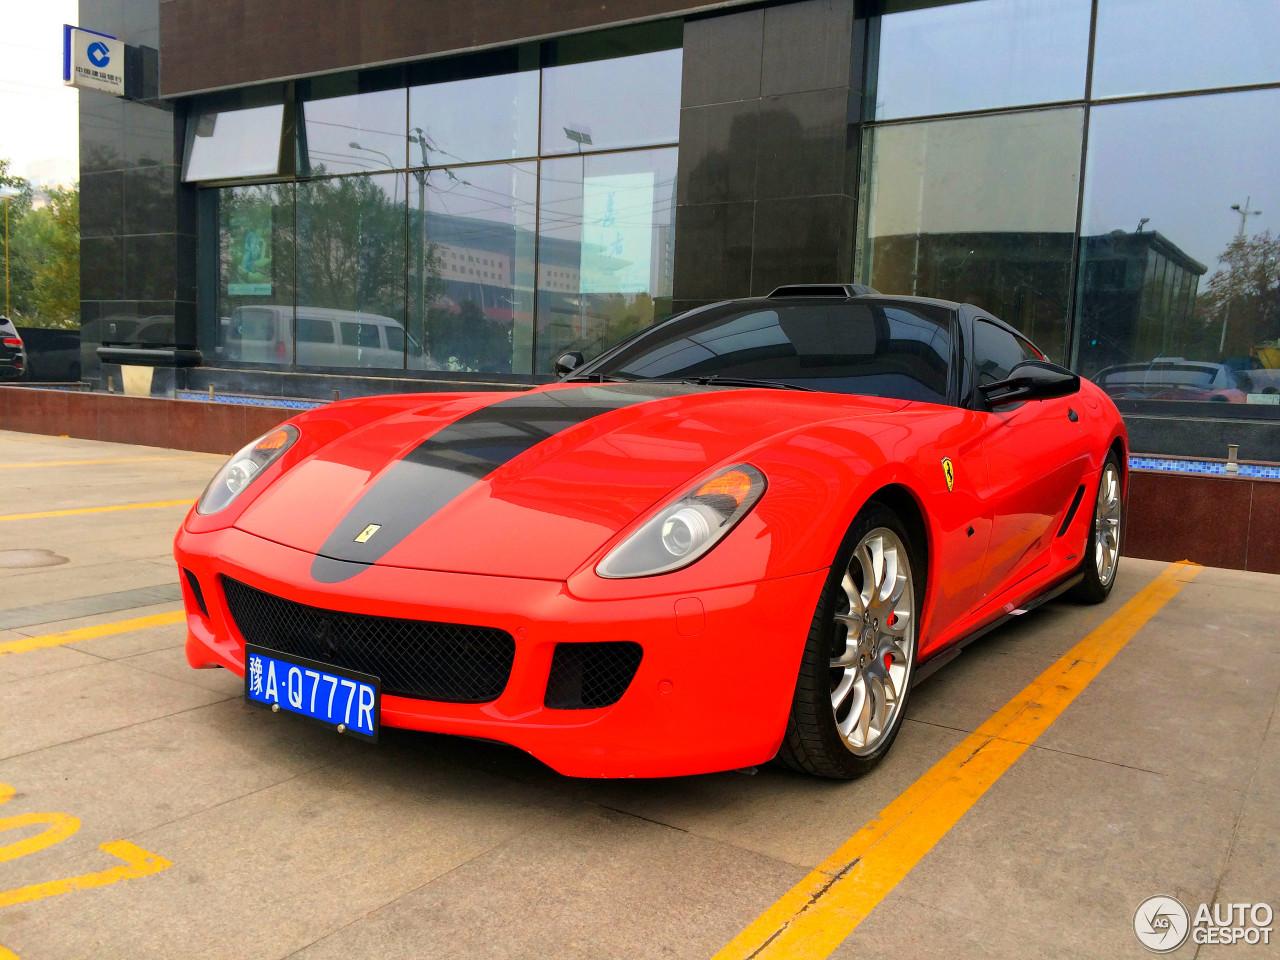 Ferrari 599 gtb fiorano hgte china edition 25 november 2014 3 i ferrari 599 gtb fiorano hgte china edition 3 vanachro Image collections